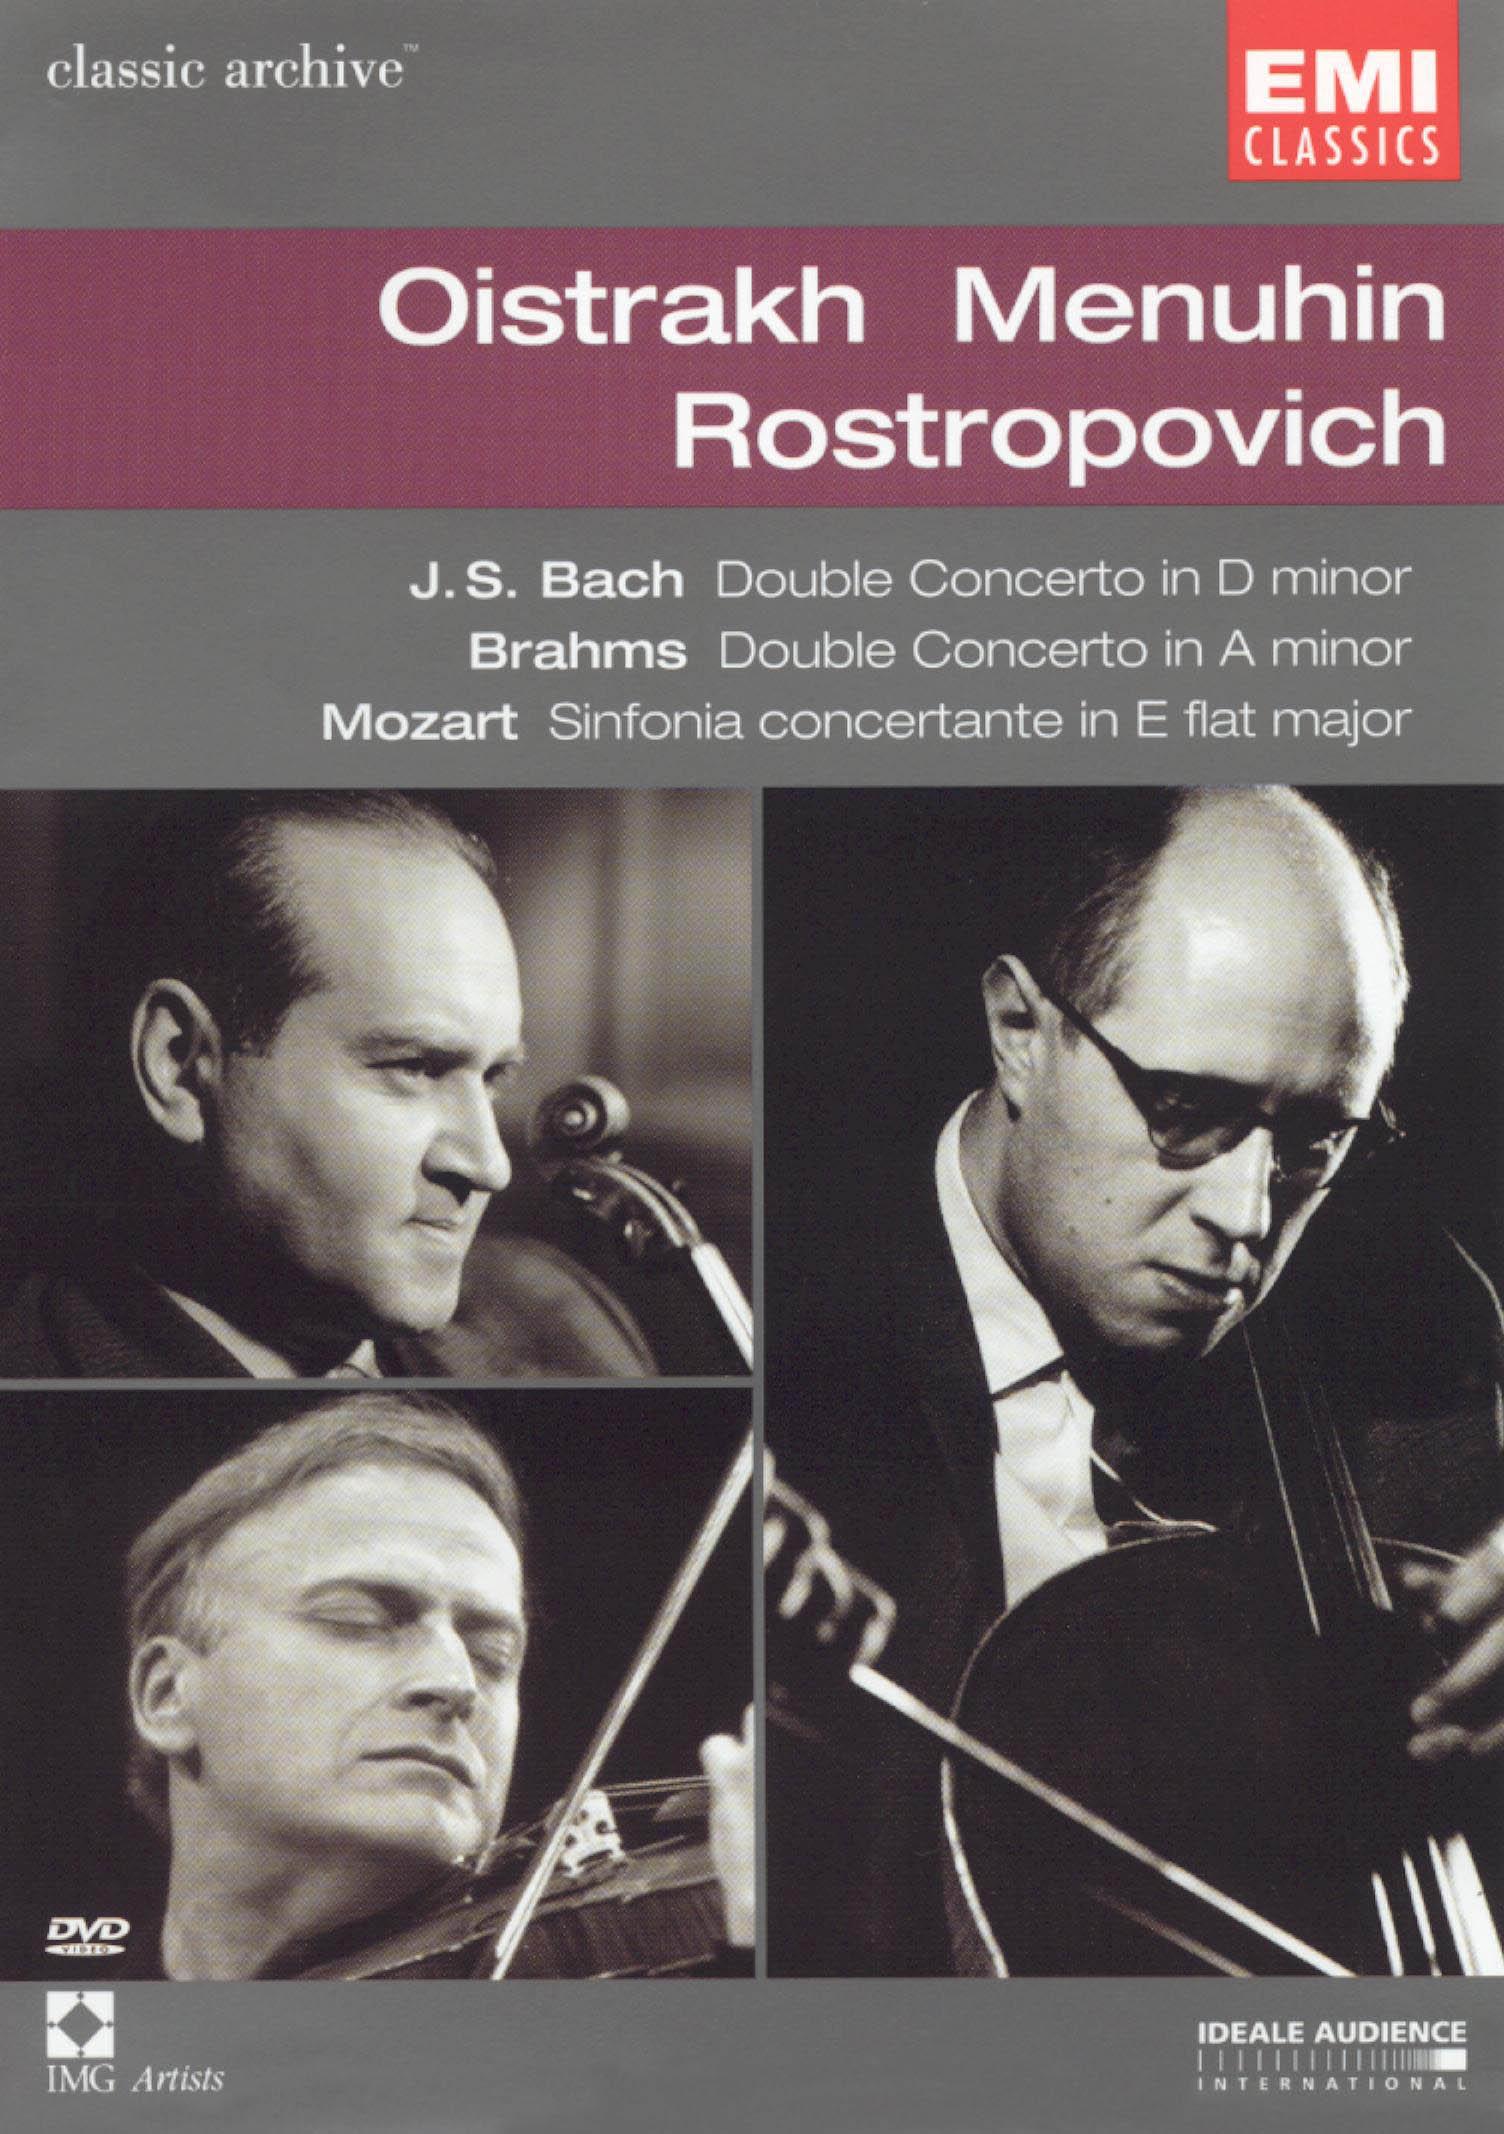 Classics Archive: Oistrakh/Menhuin/Rostropvich